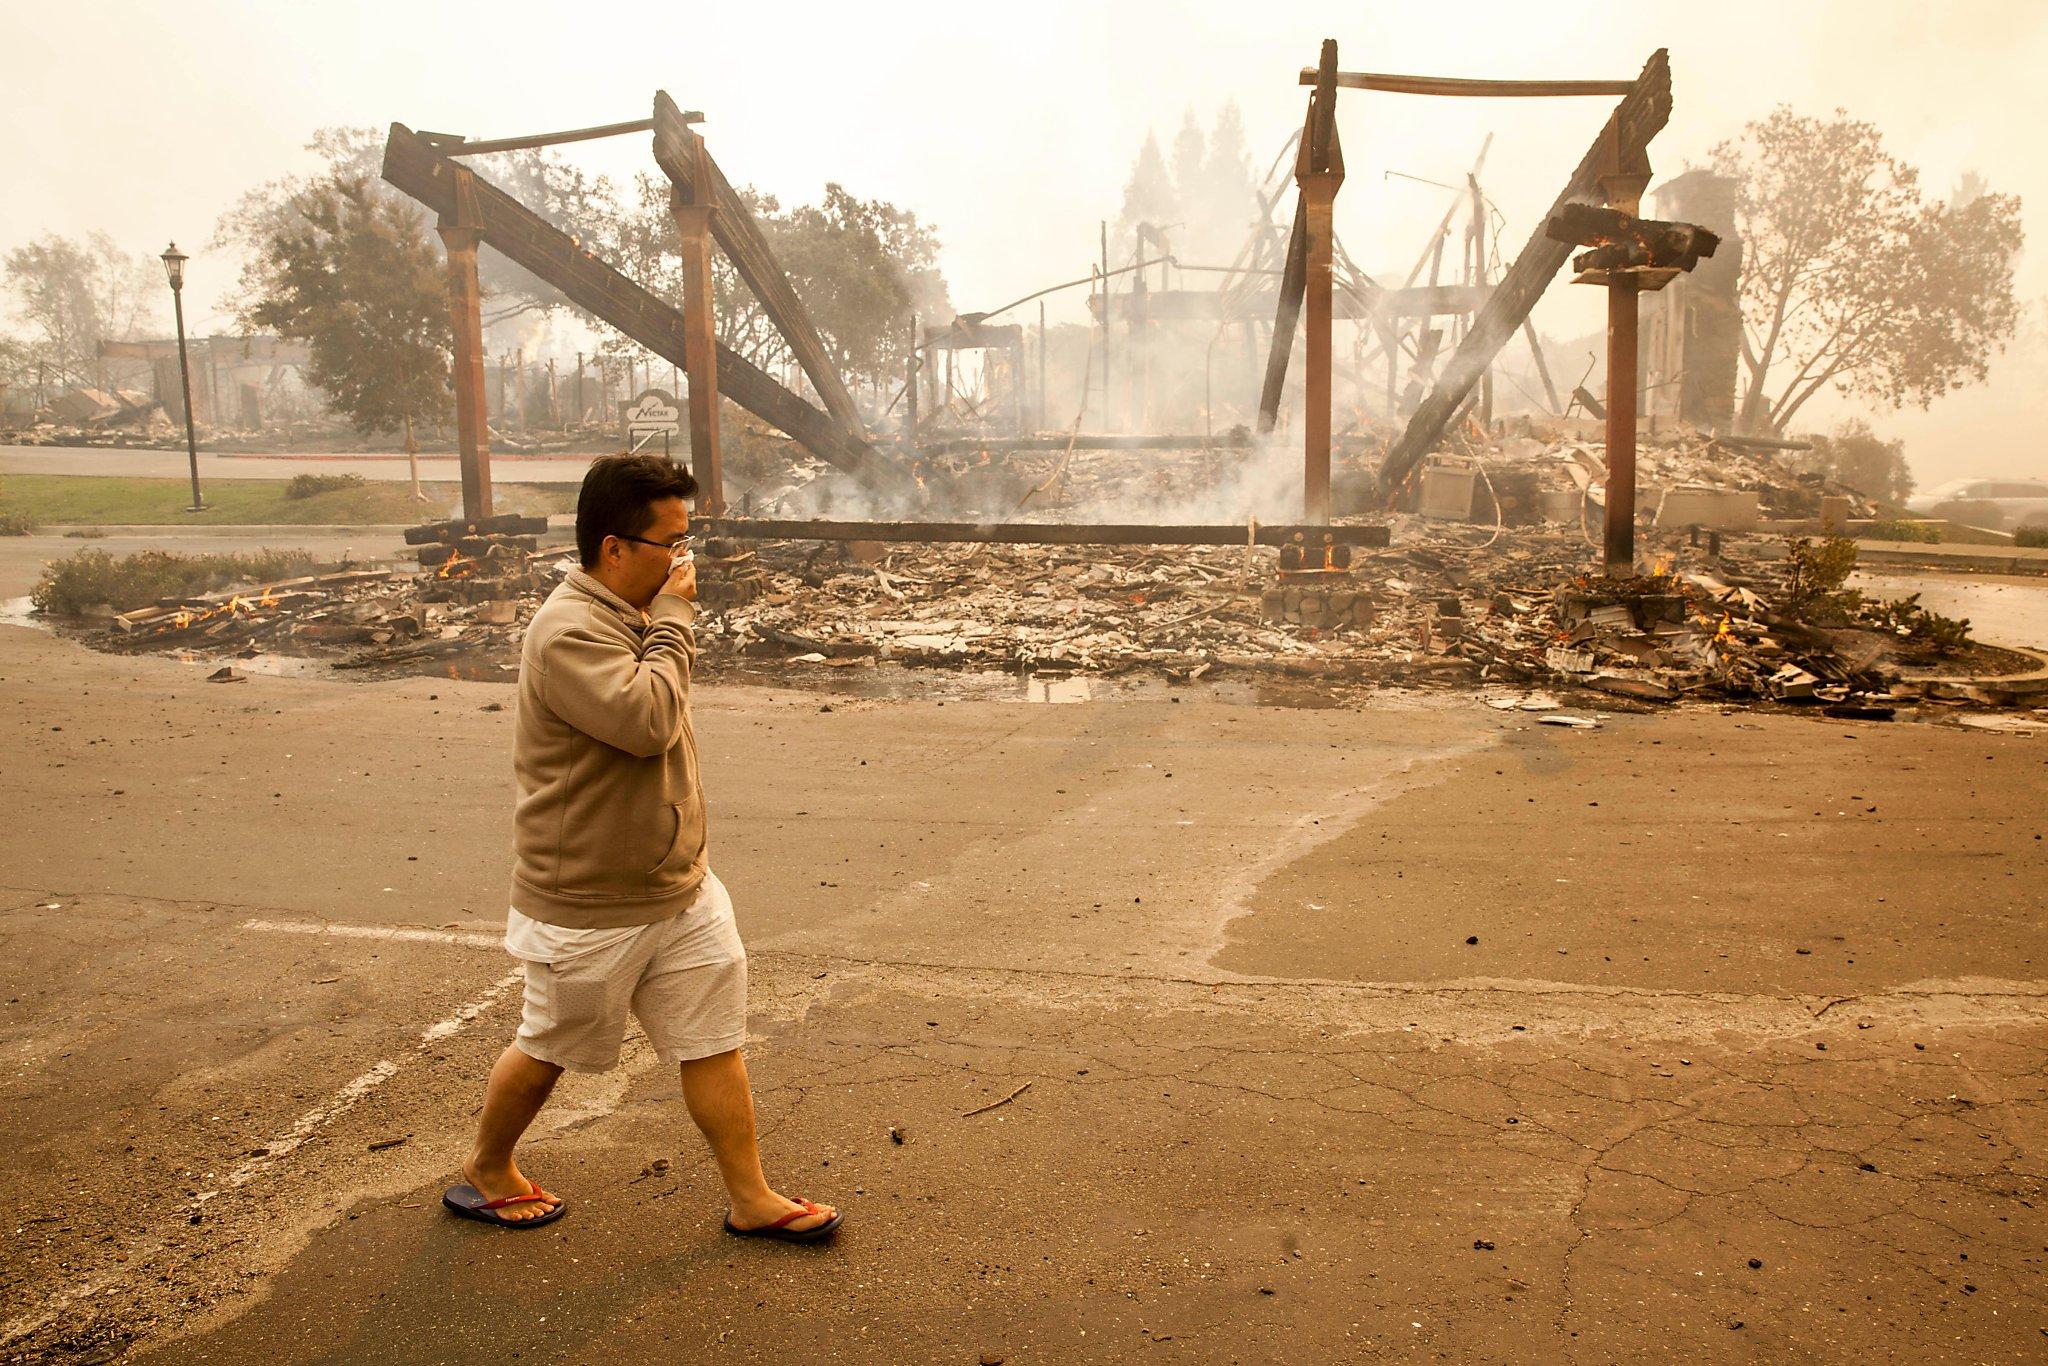 Fire destroys Napa winery, 2 Santa Rosa hotels - SFGate